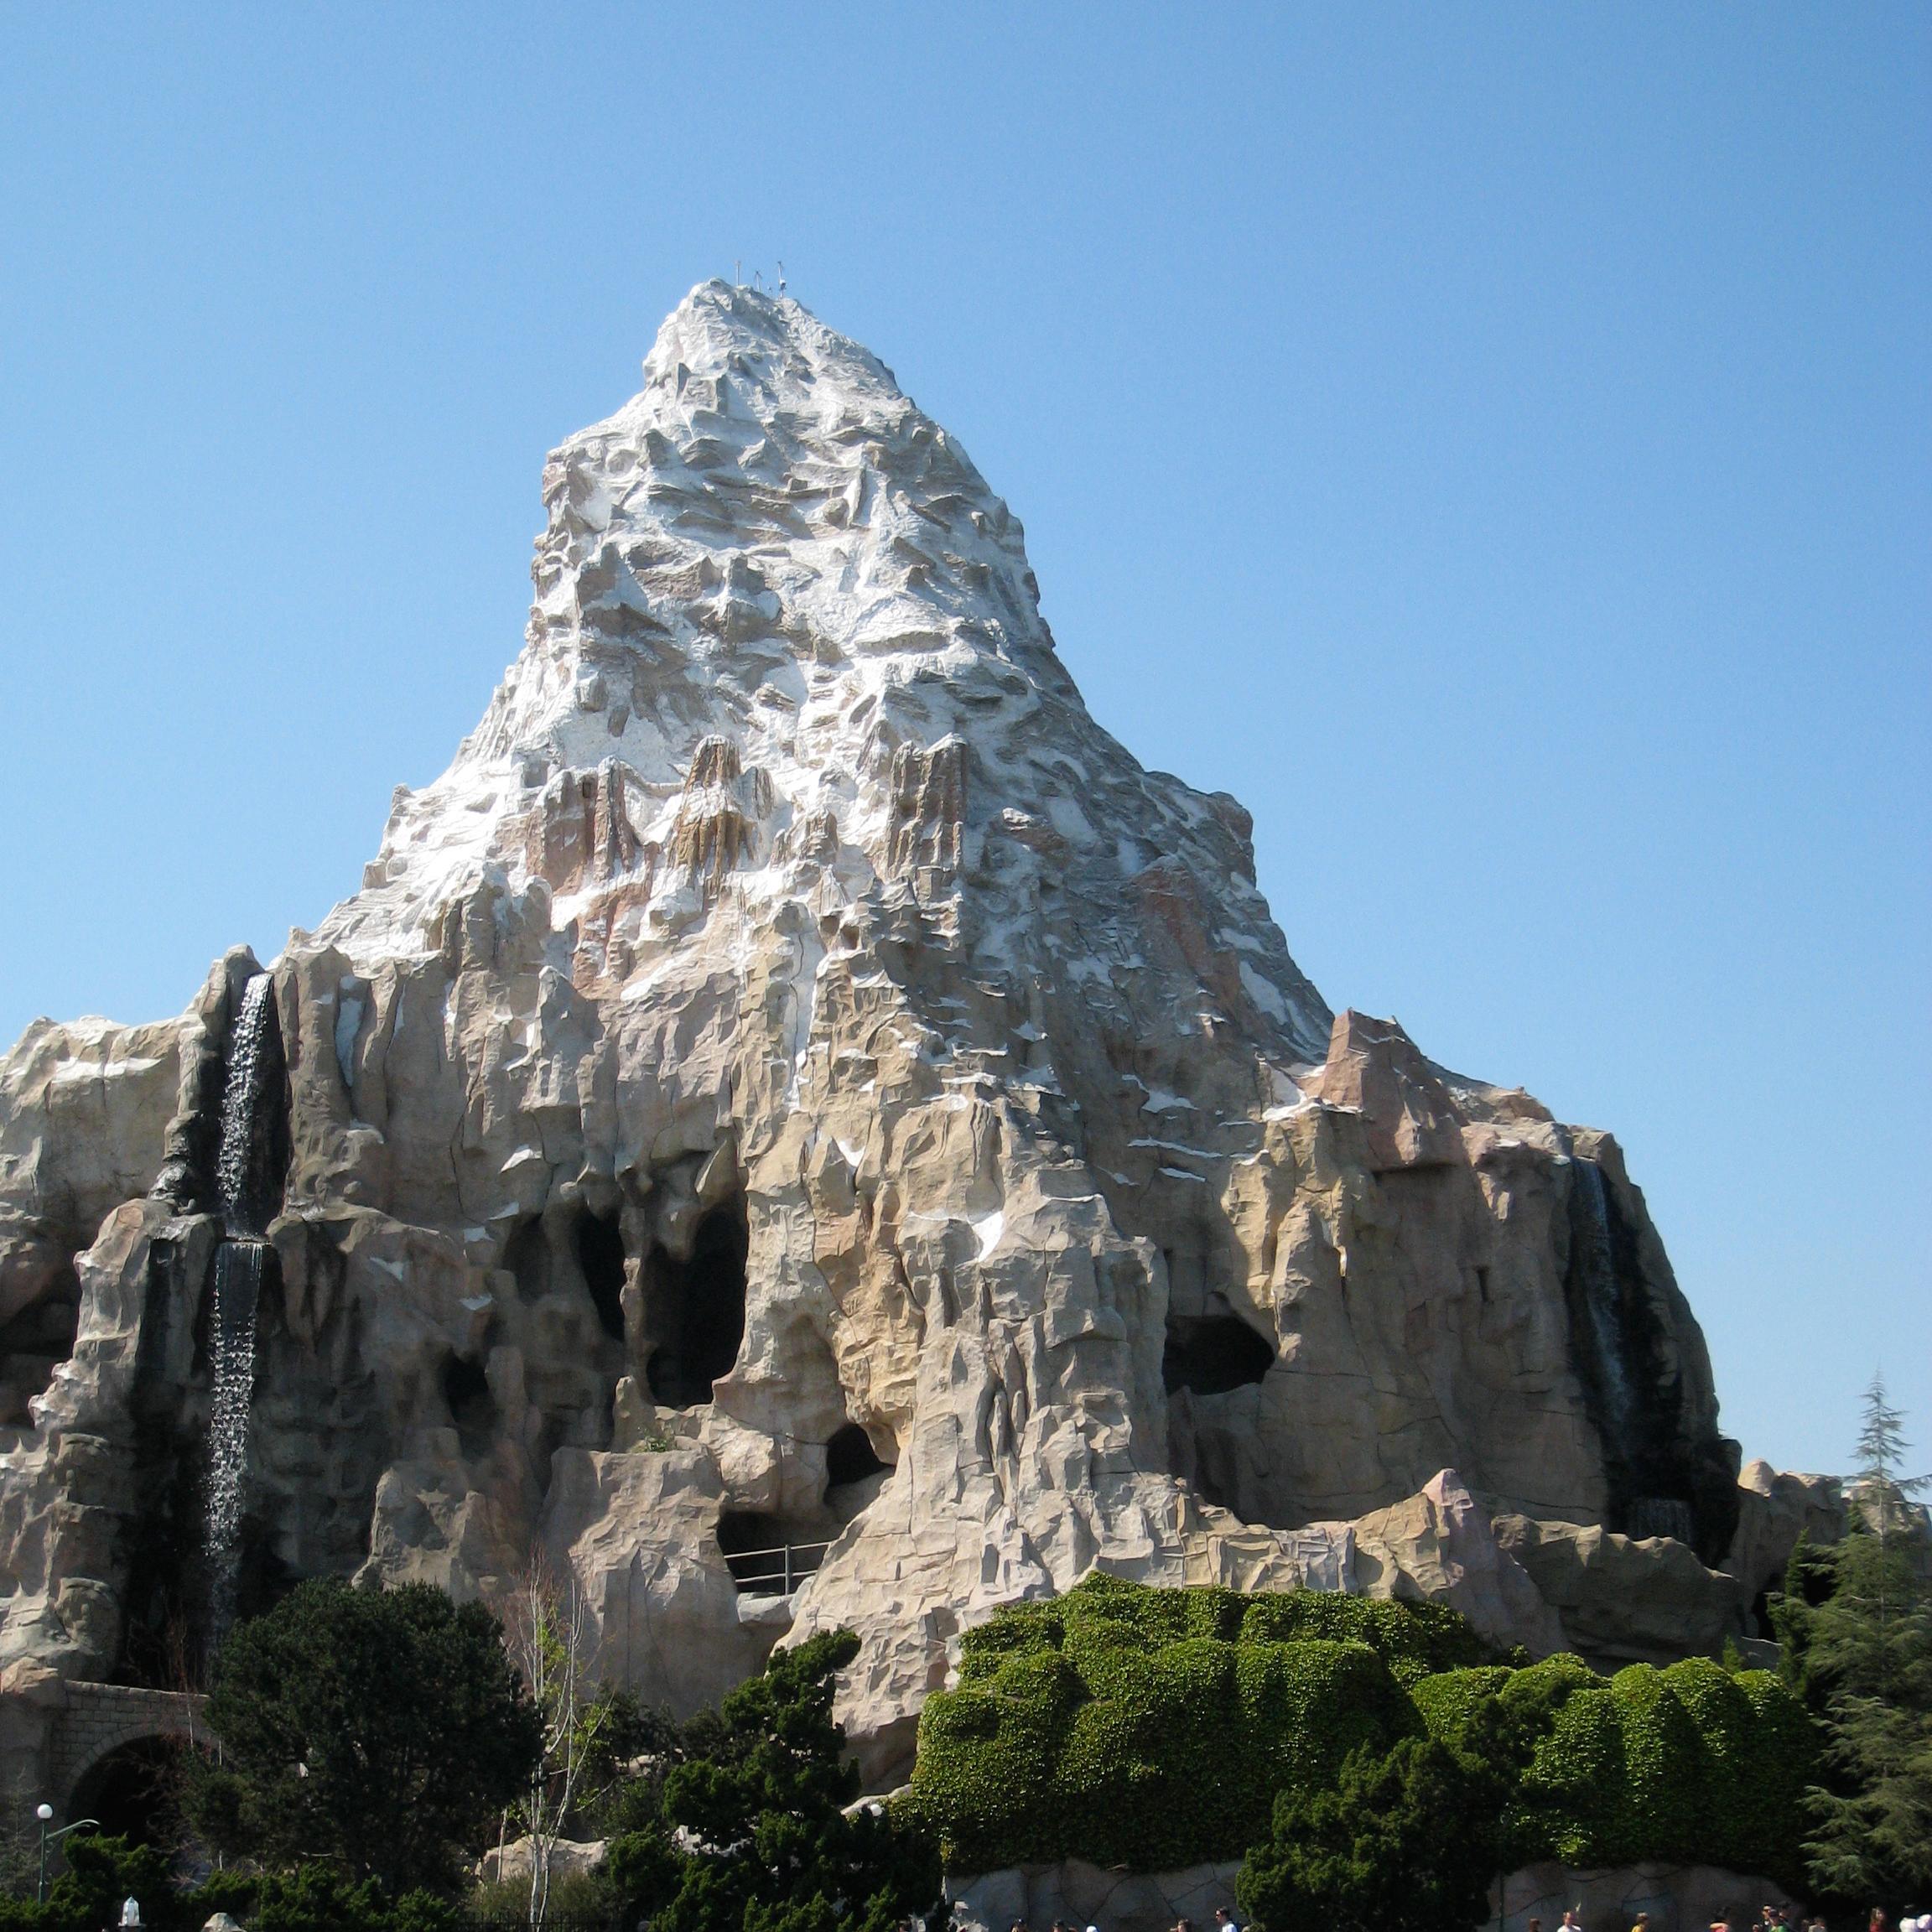 Disneyland Matterhorn Wallpaper Wallpapersafari